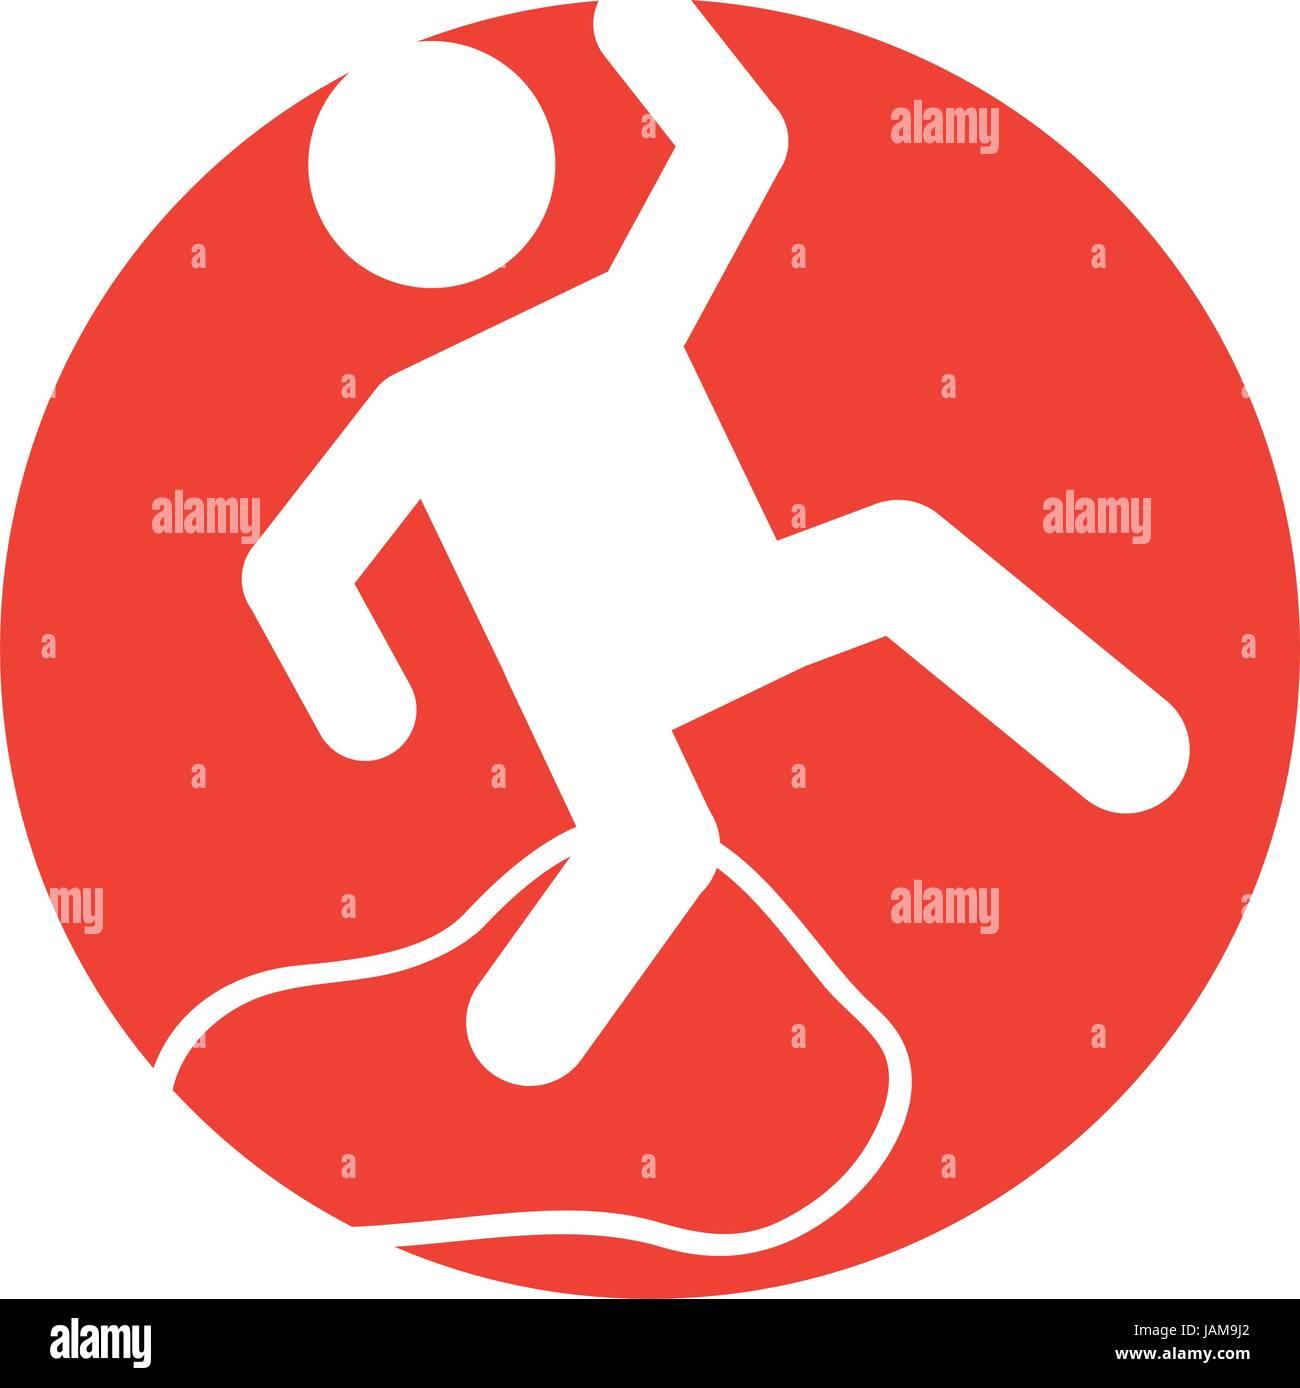 Accident on slippery floor - Stock Image